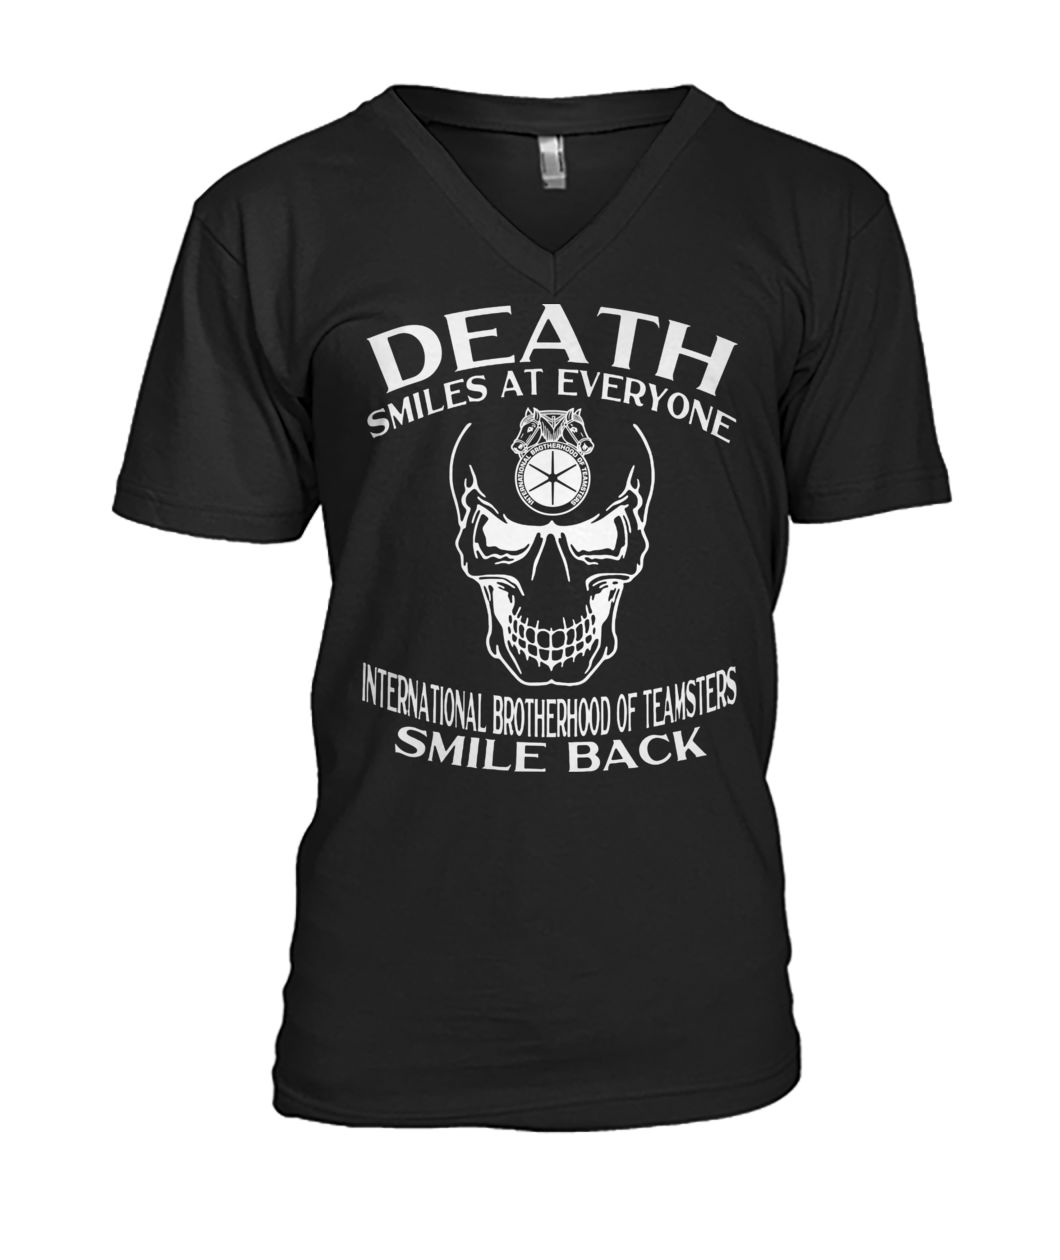 Skull death smiles at everyone international brotherhood of teamsters smile back v-neck